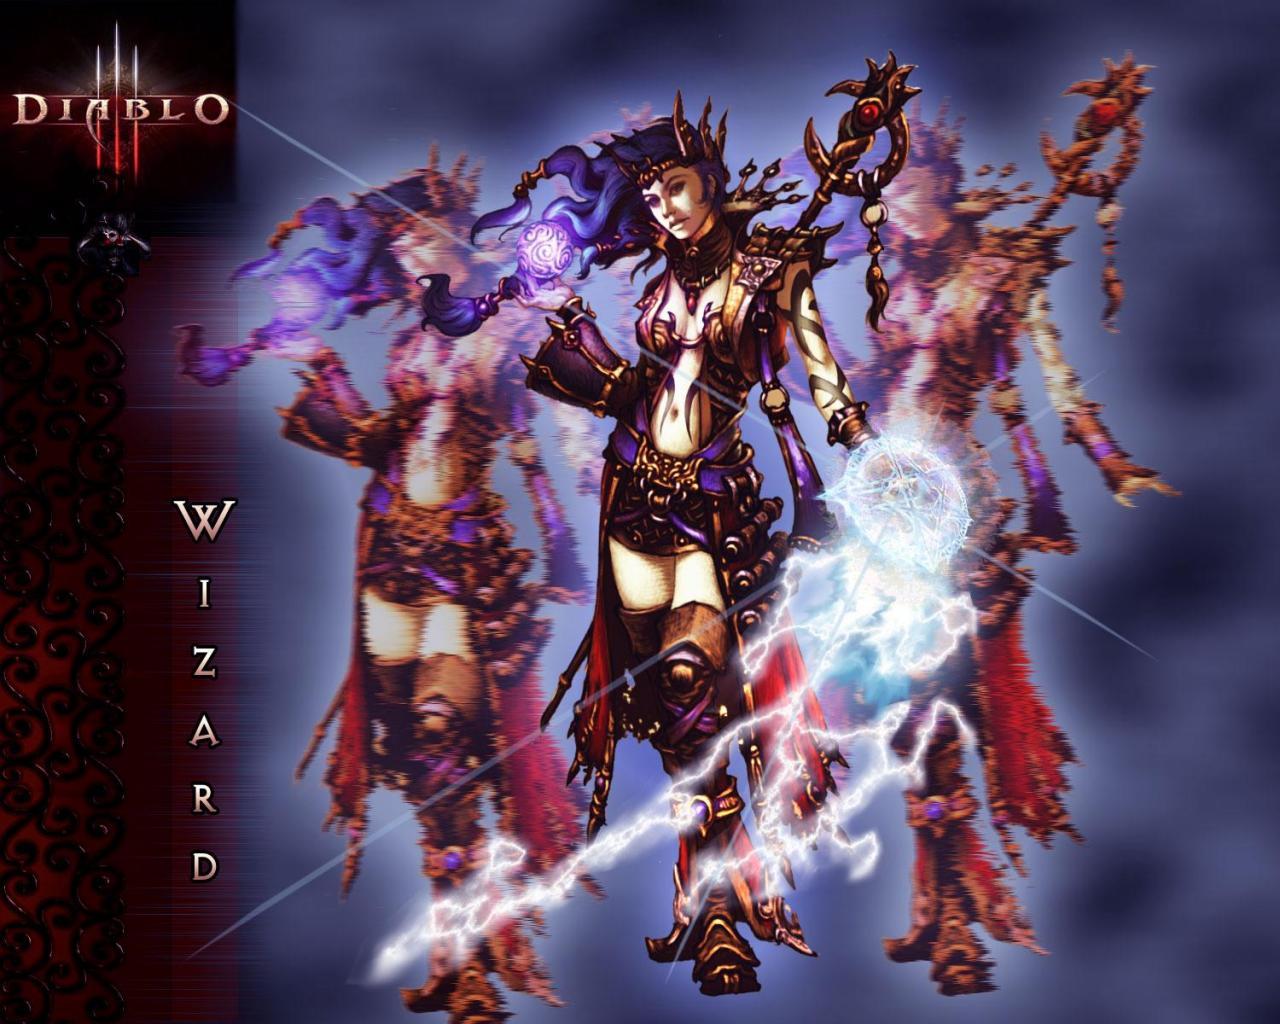 Diablo 3 xbox 360 nudepatch baixar exploited images